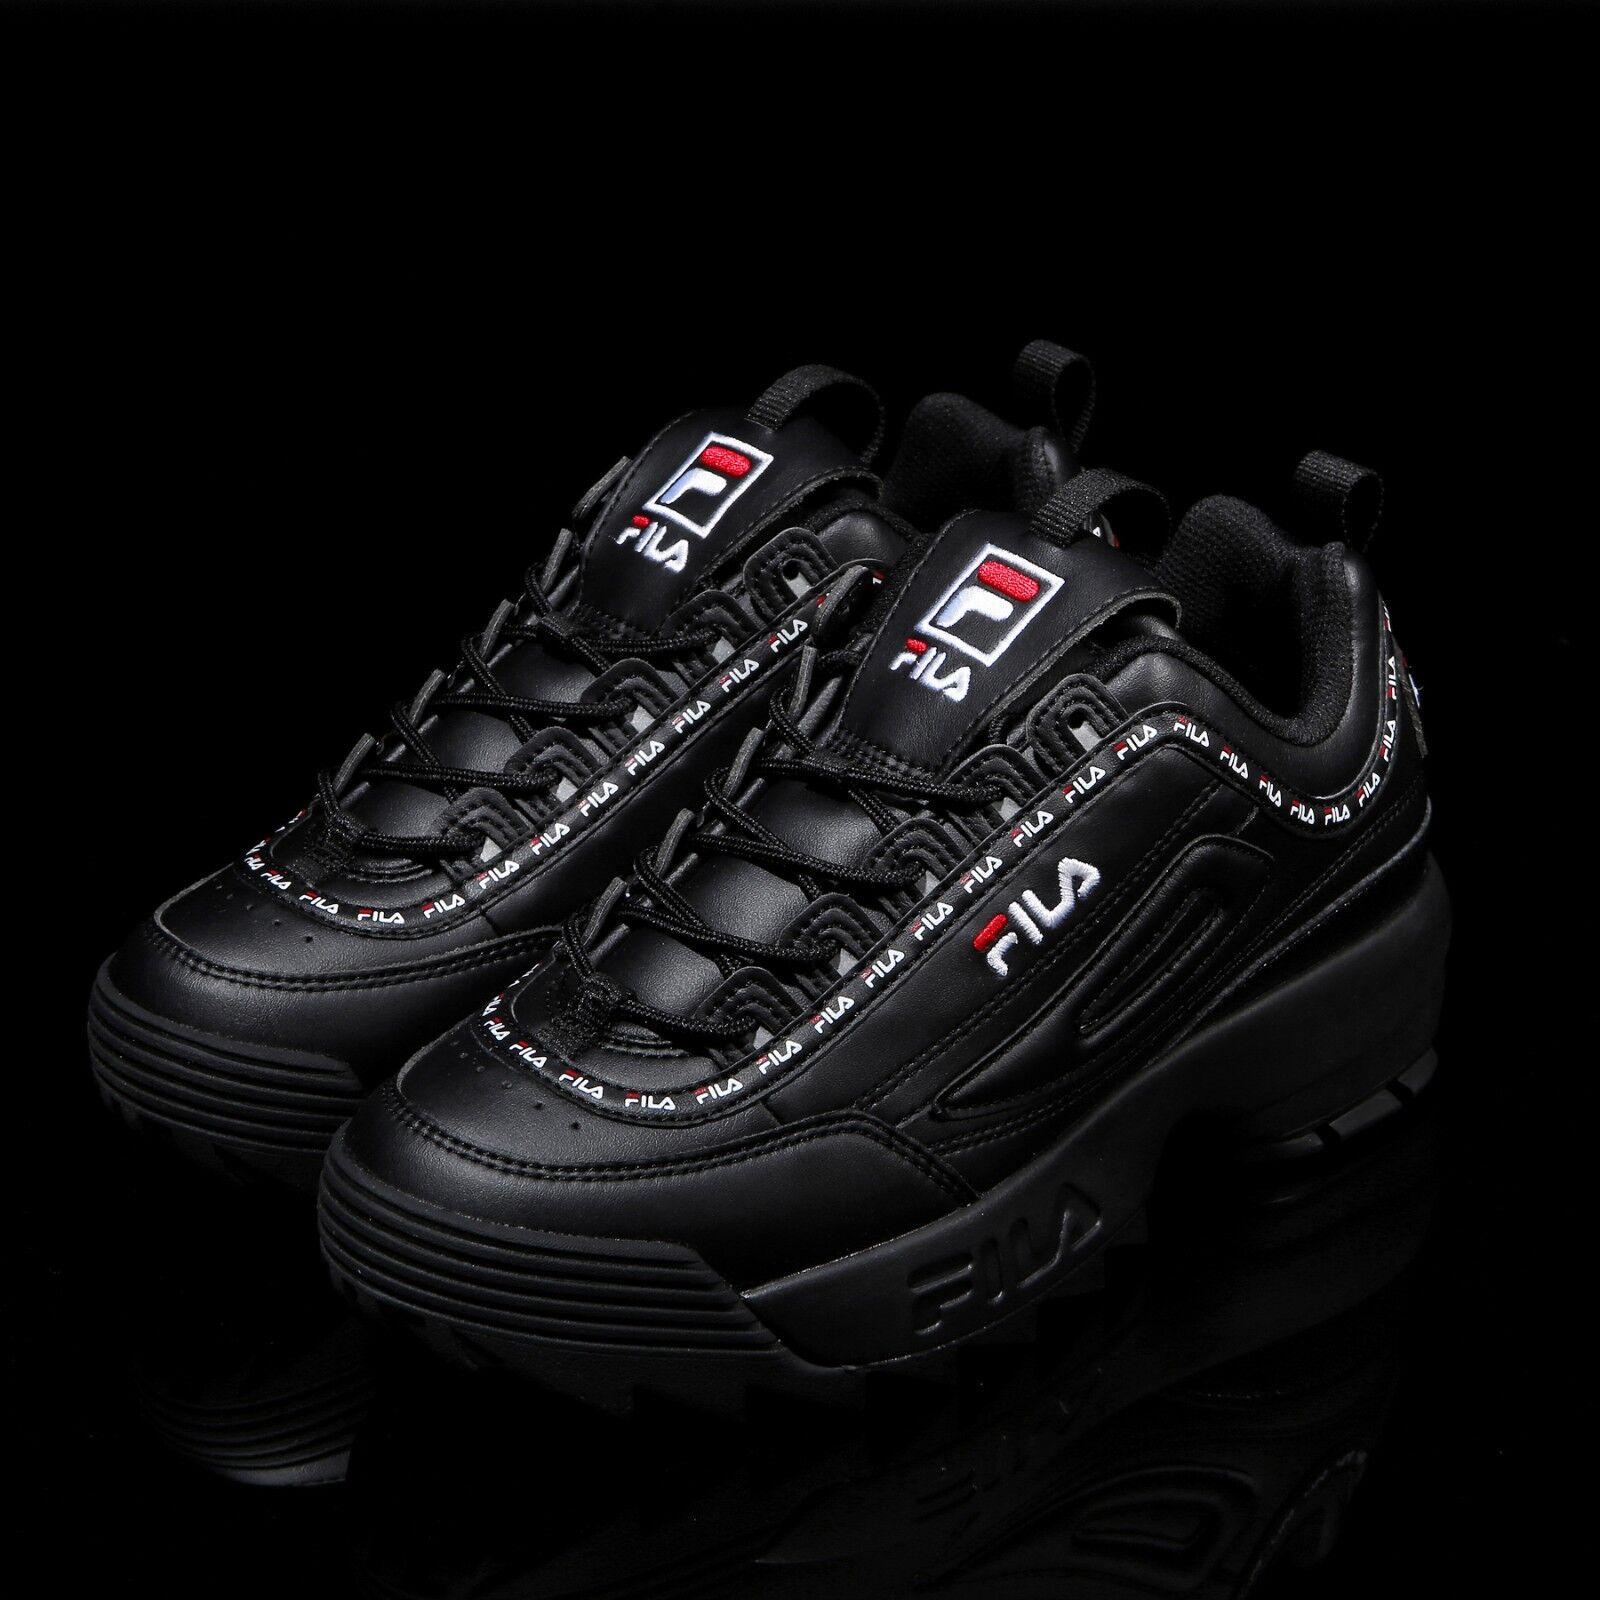 Fila Disruptor II 2 Noir Tapey Tape Chaussures Unisexe Taille UK 3-9 FS1HTA3092X_BBK